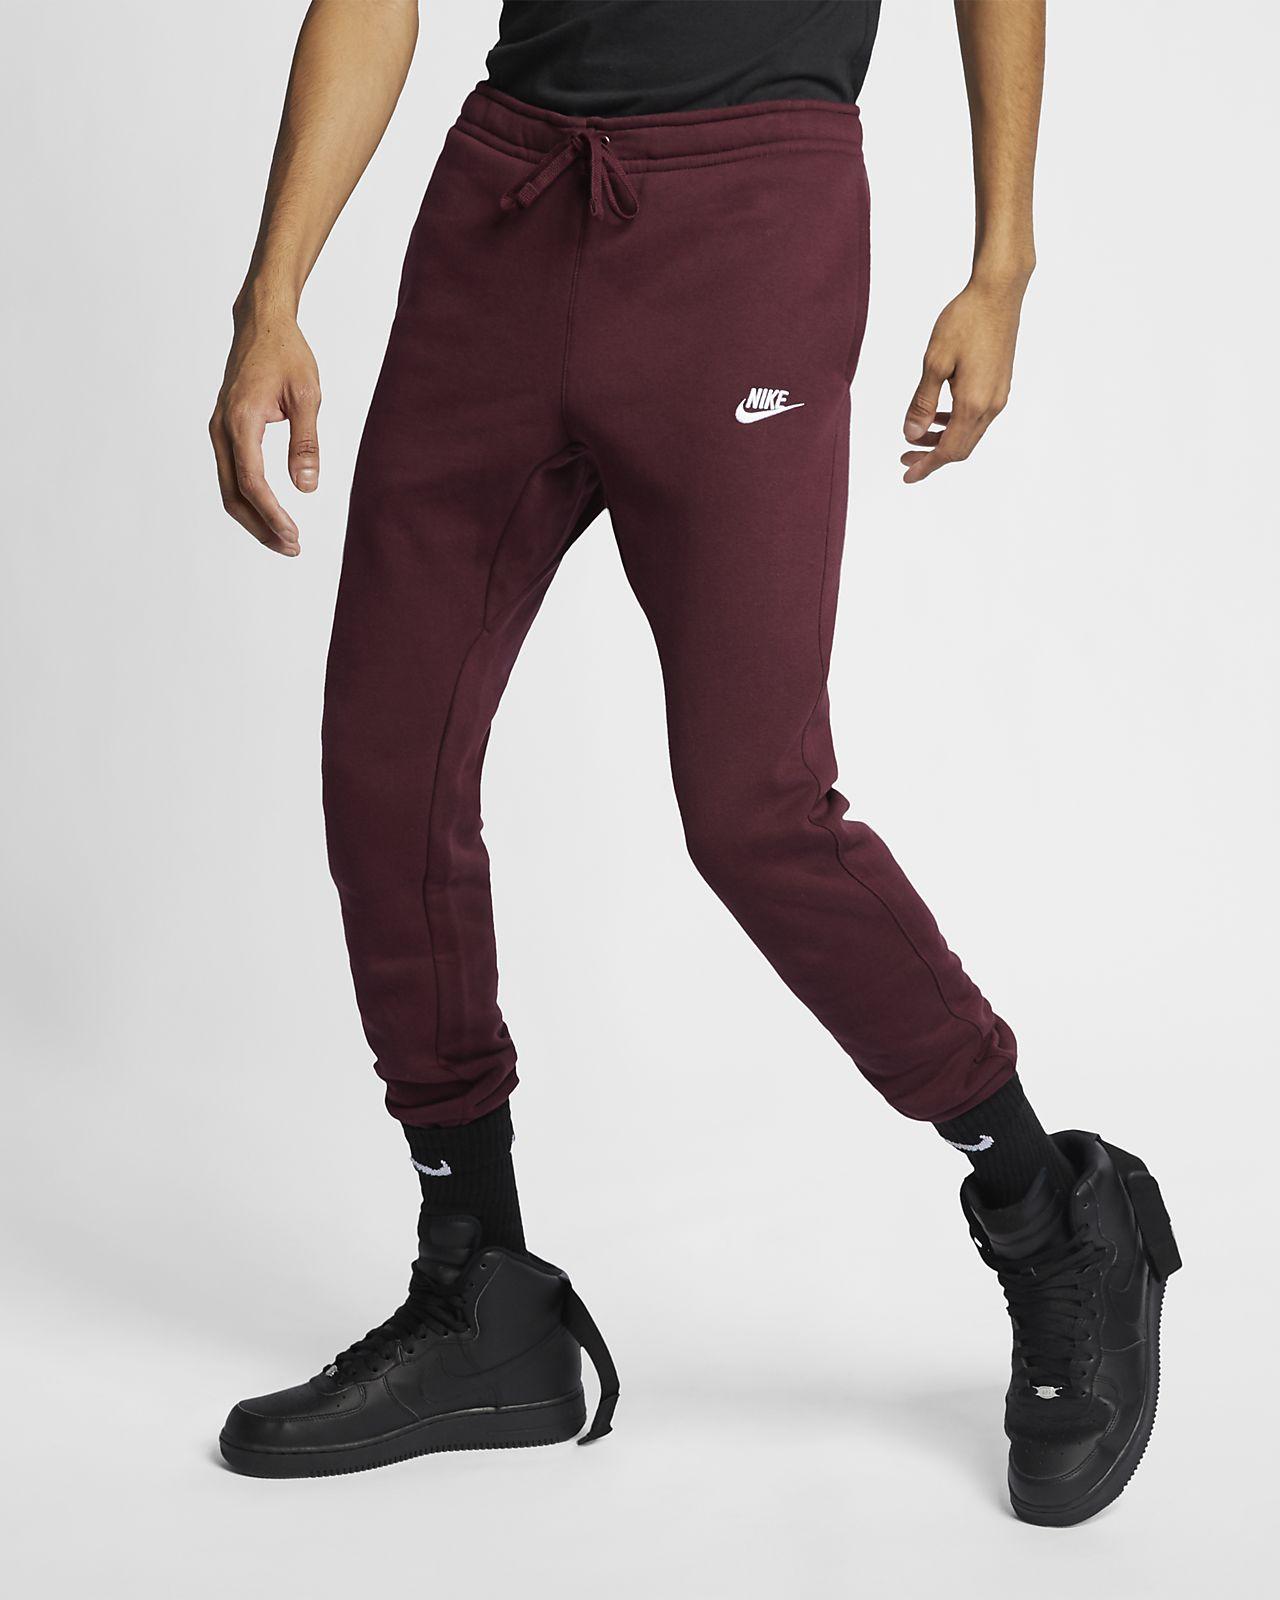 47774275a030ab Nike Sportswear Club Fleece Men's Joggers. Nike.com PT